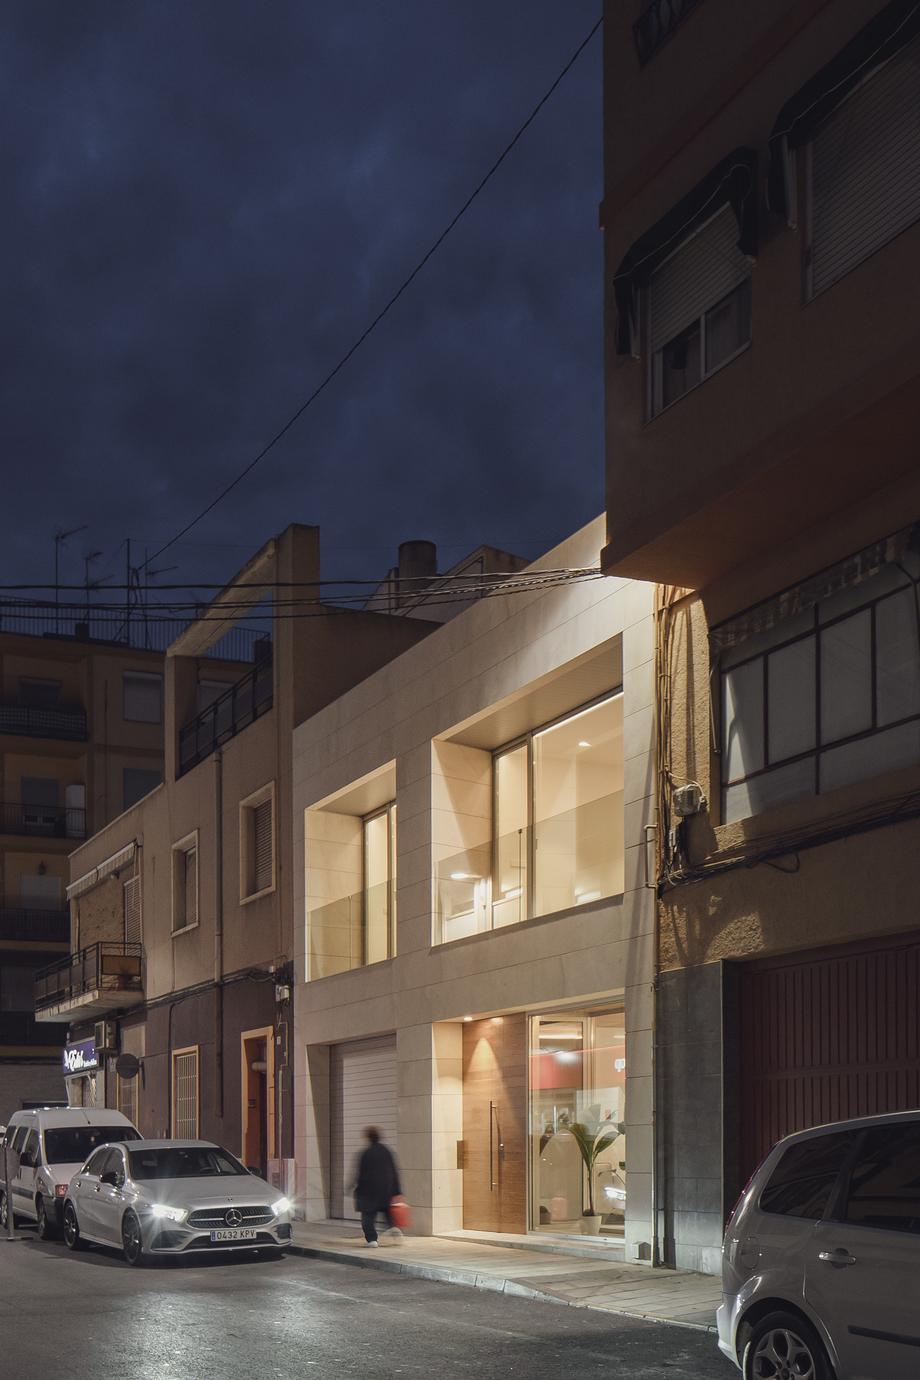 vivienda en elda de pablo muñoz paya arquitectos (23) - foto david zarzoso